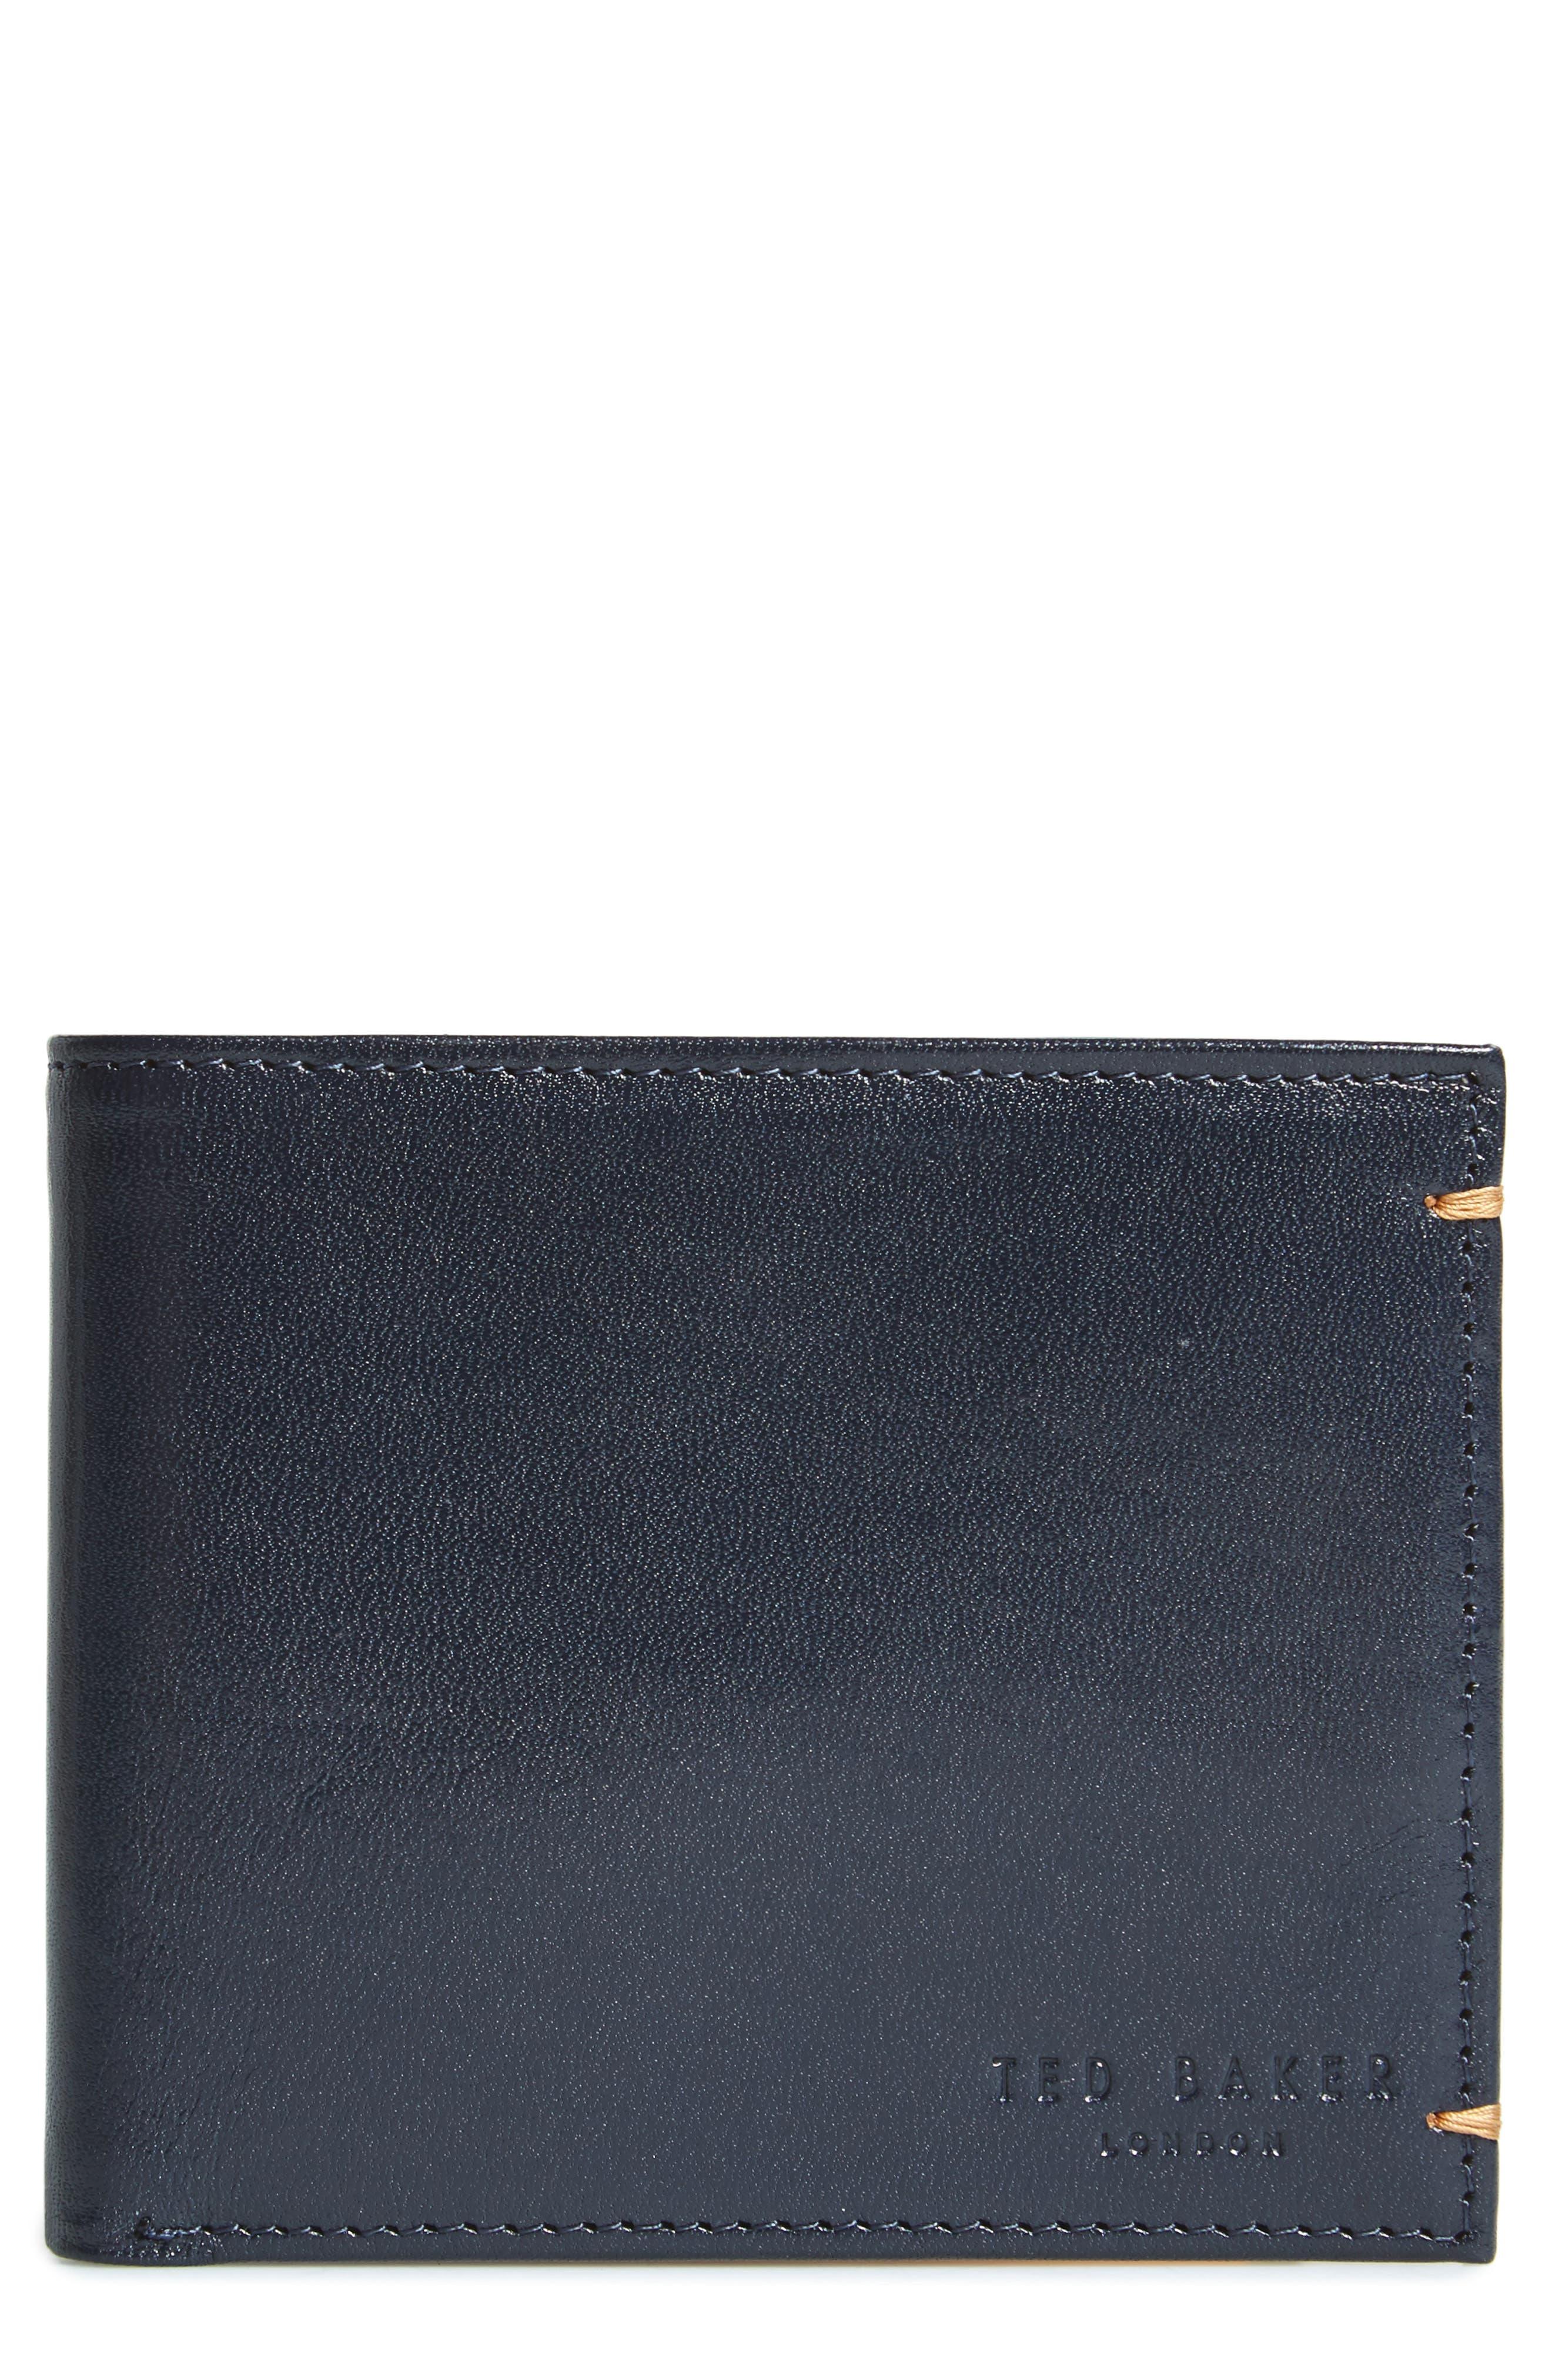 Vivid Leather Wallet,                             Main thumbnail 2, color,